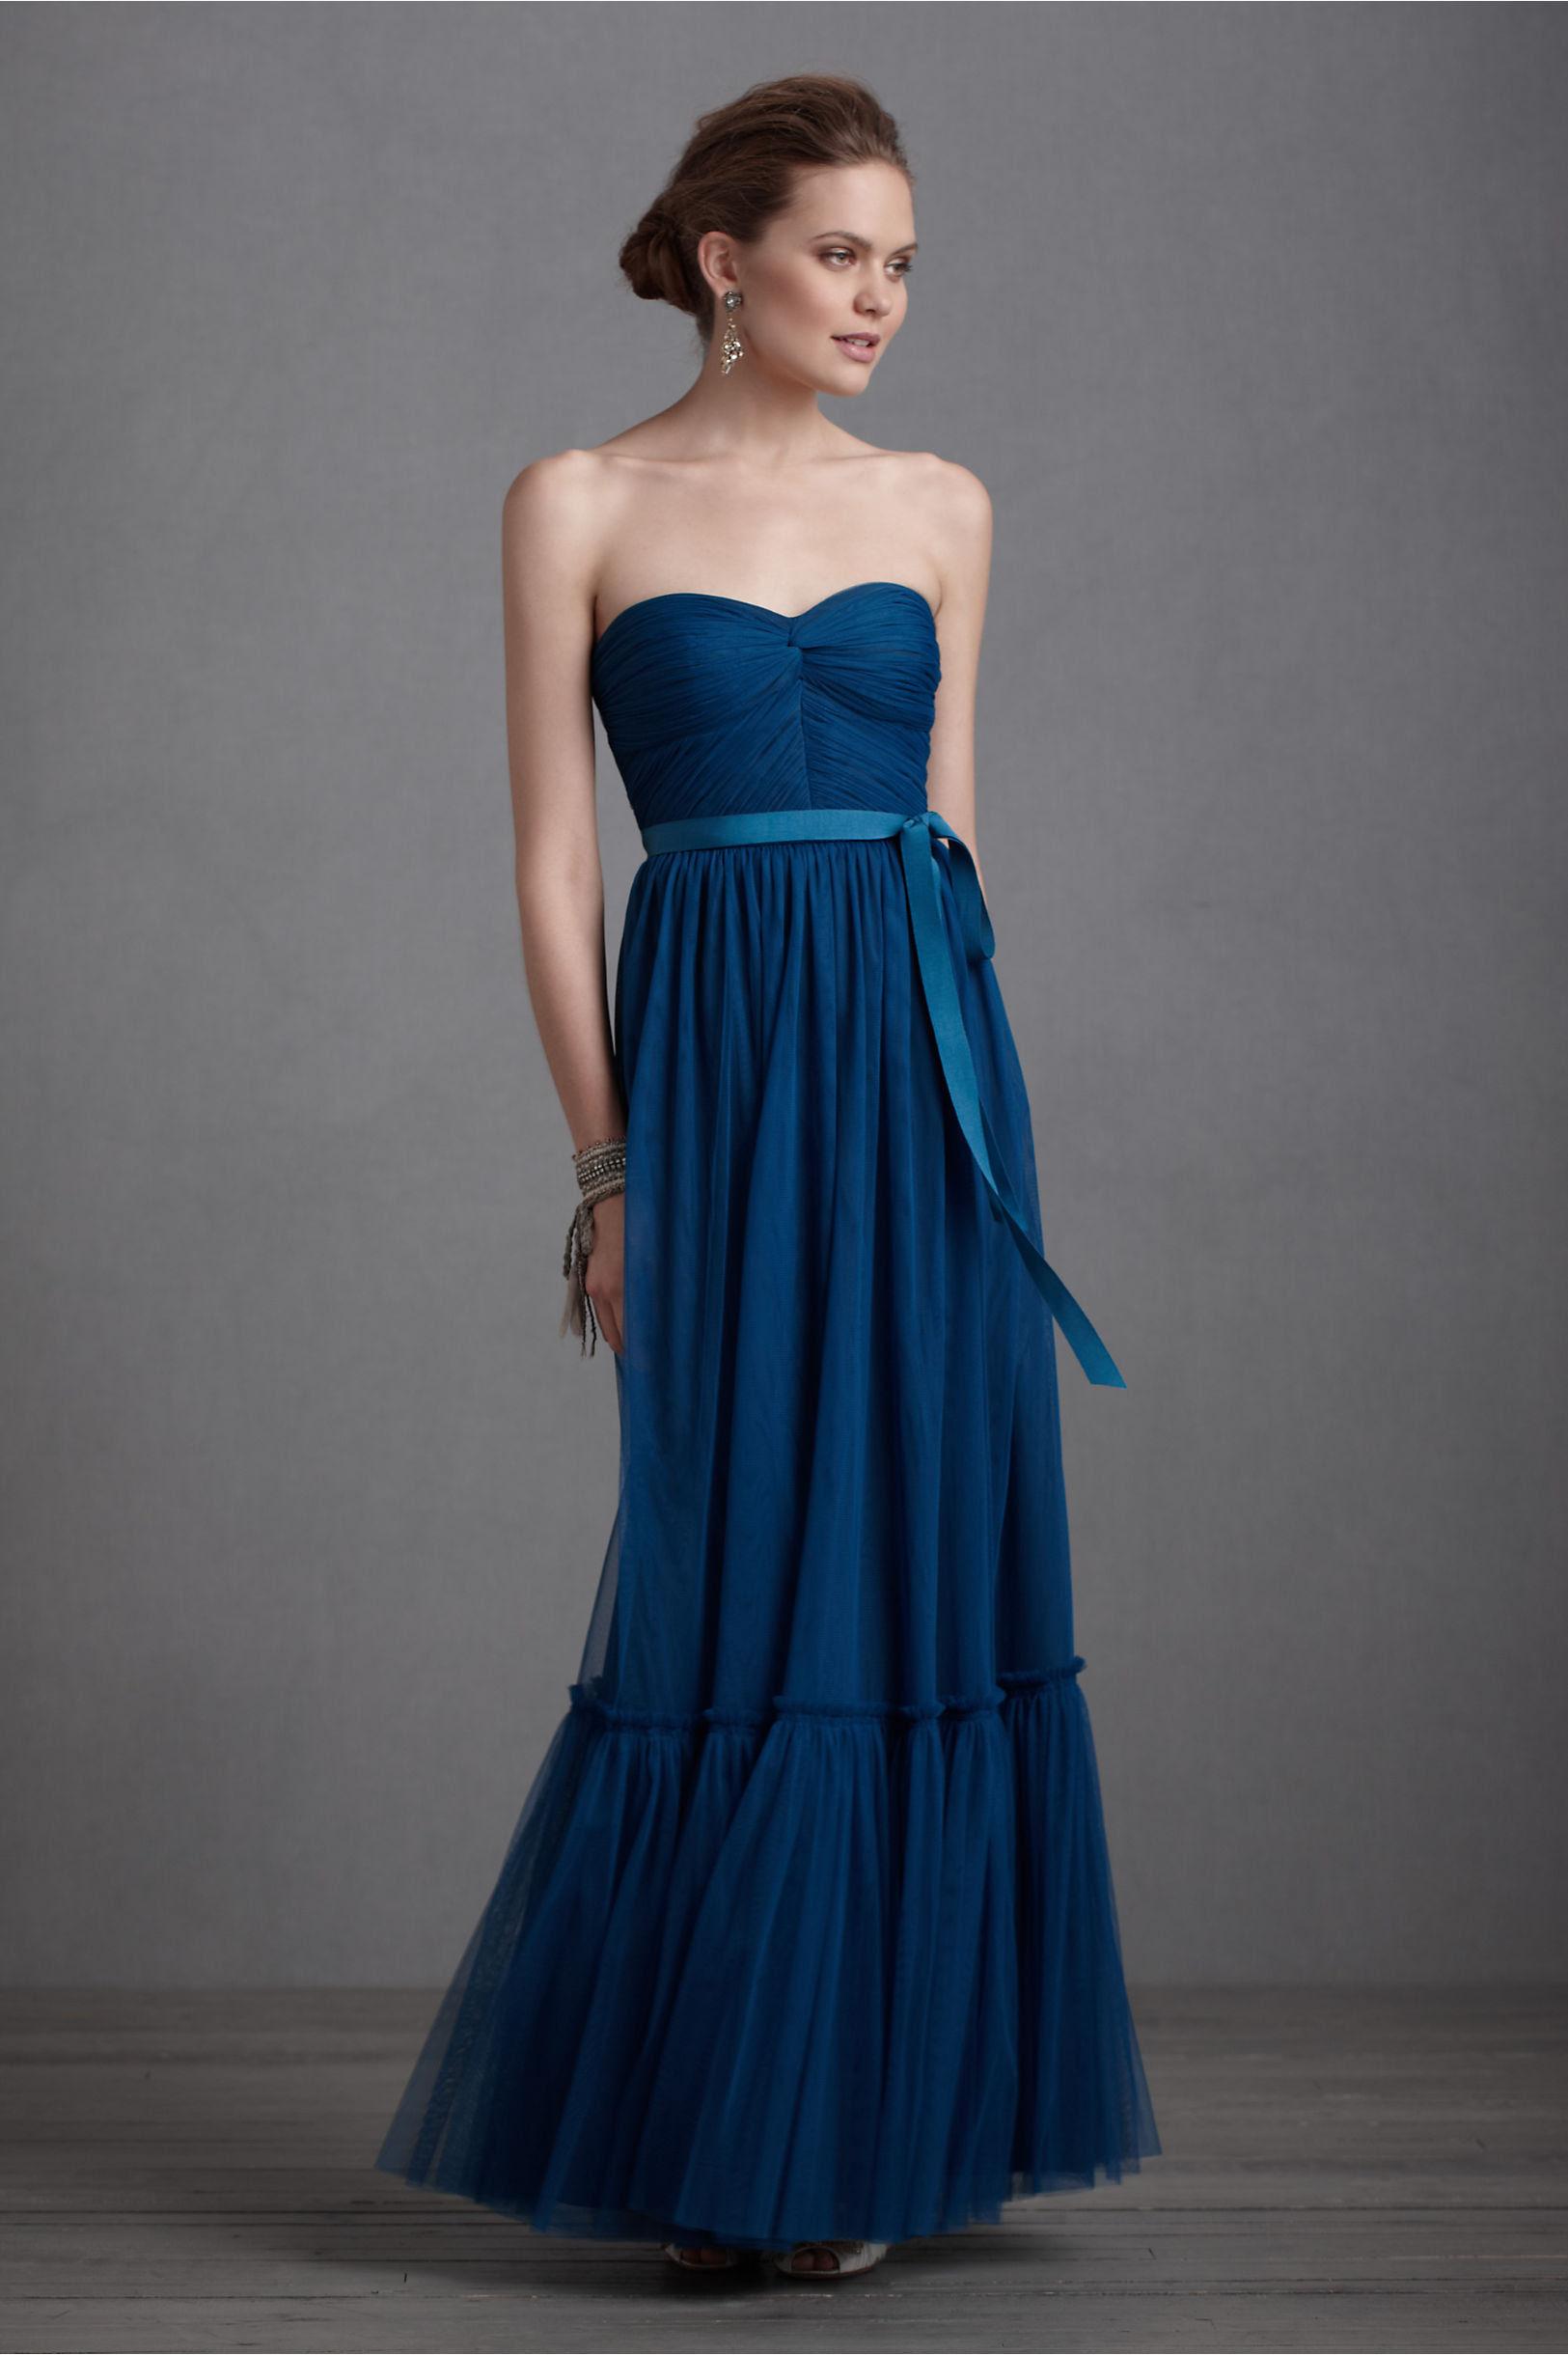 20+ Wedding Dresses Blue Dresses